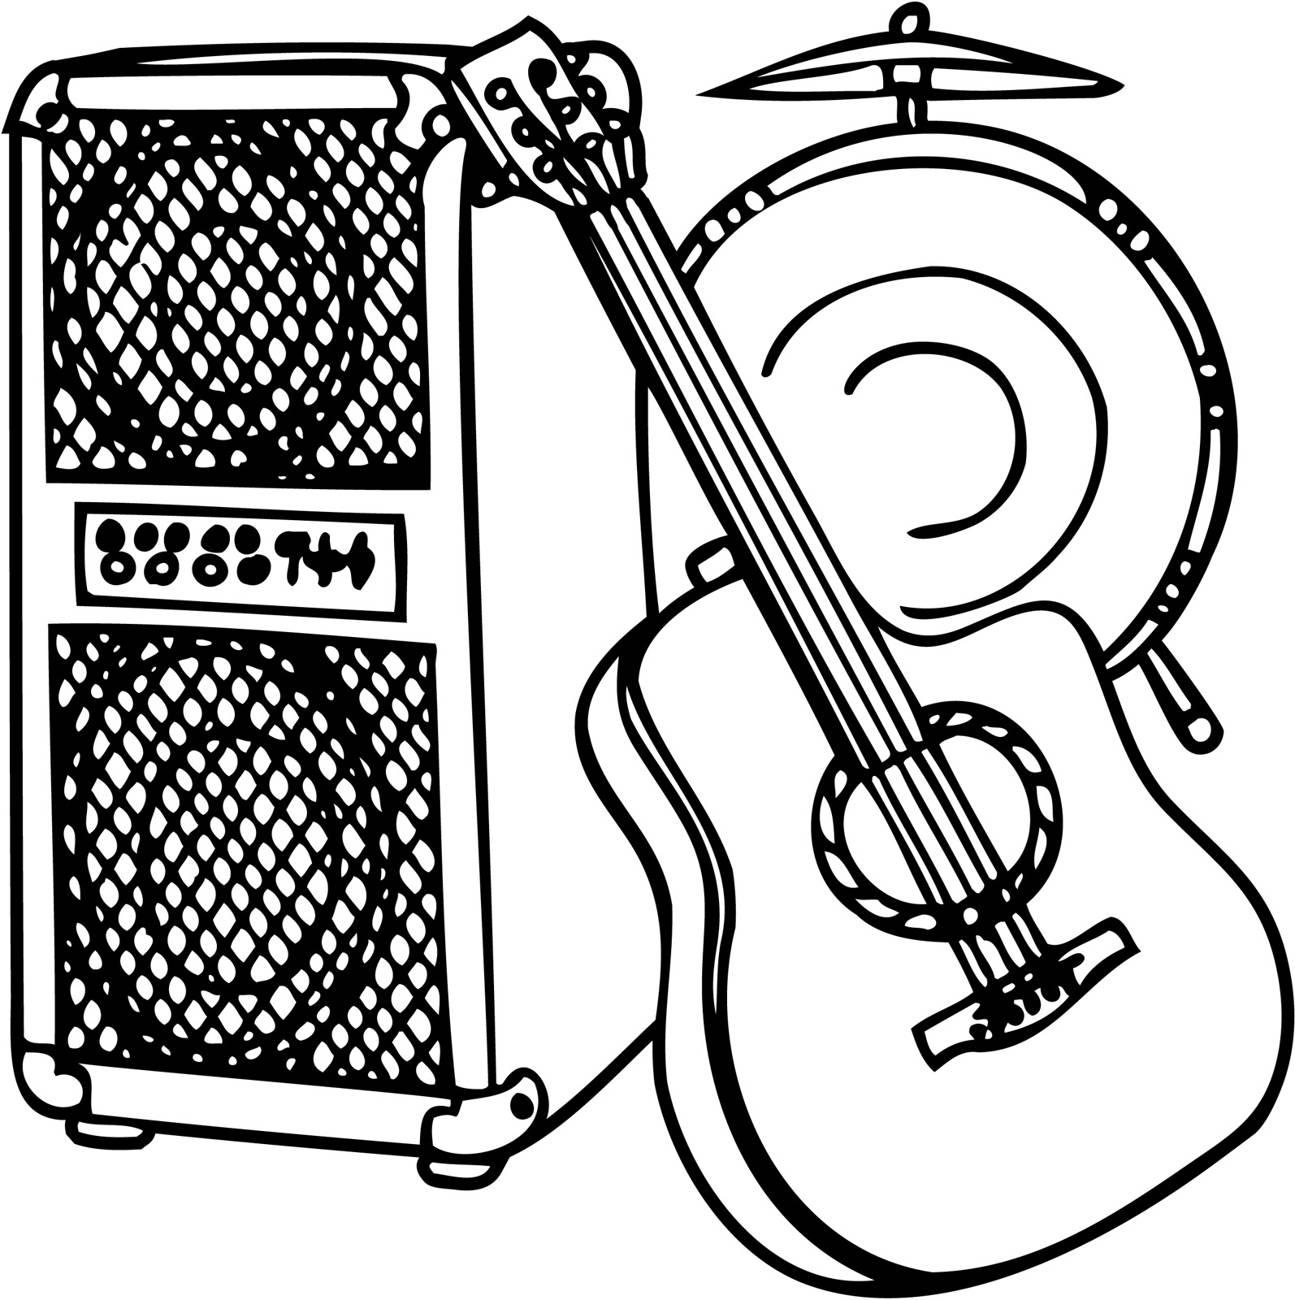 MUSIC-096